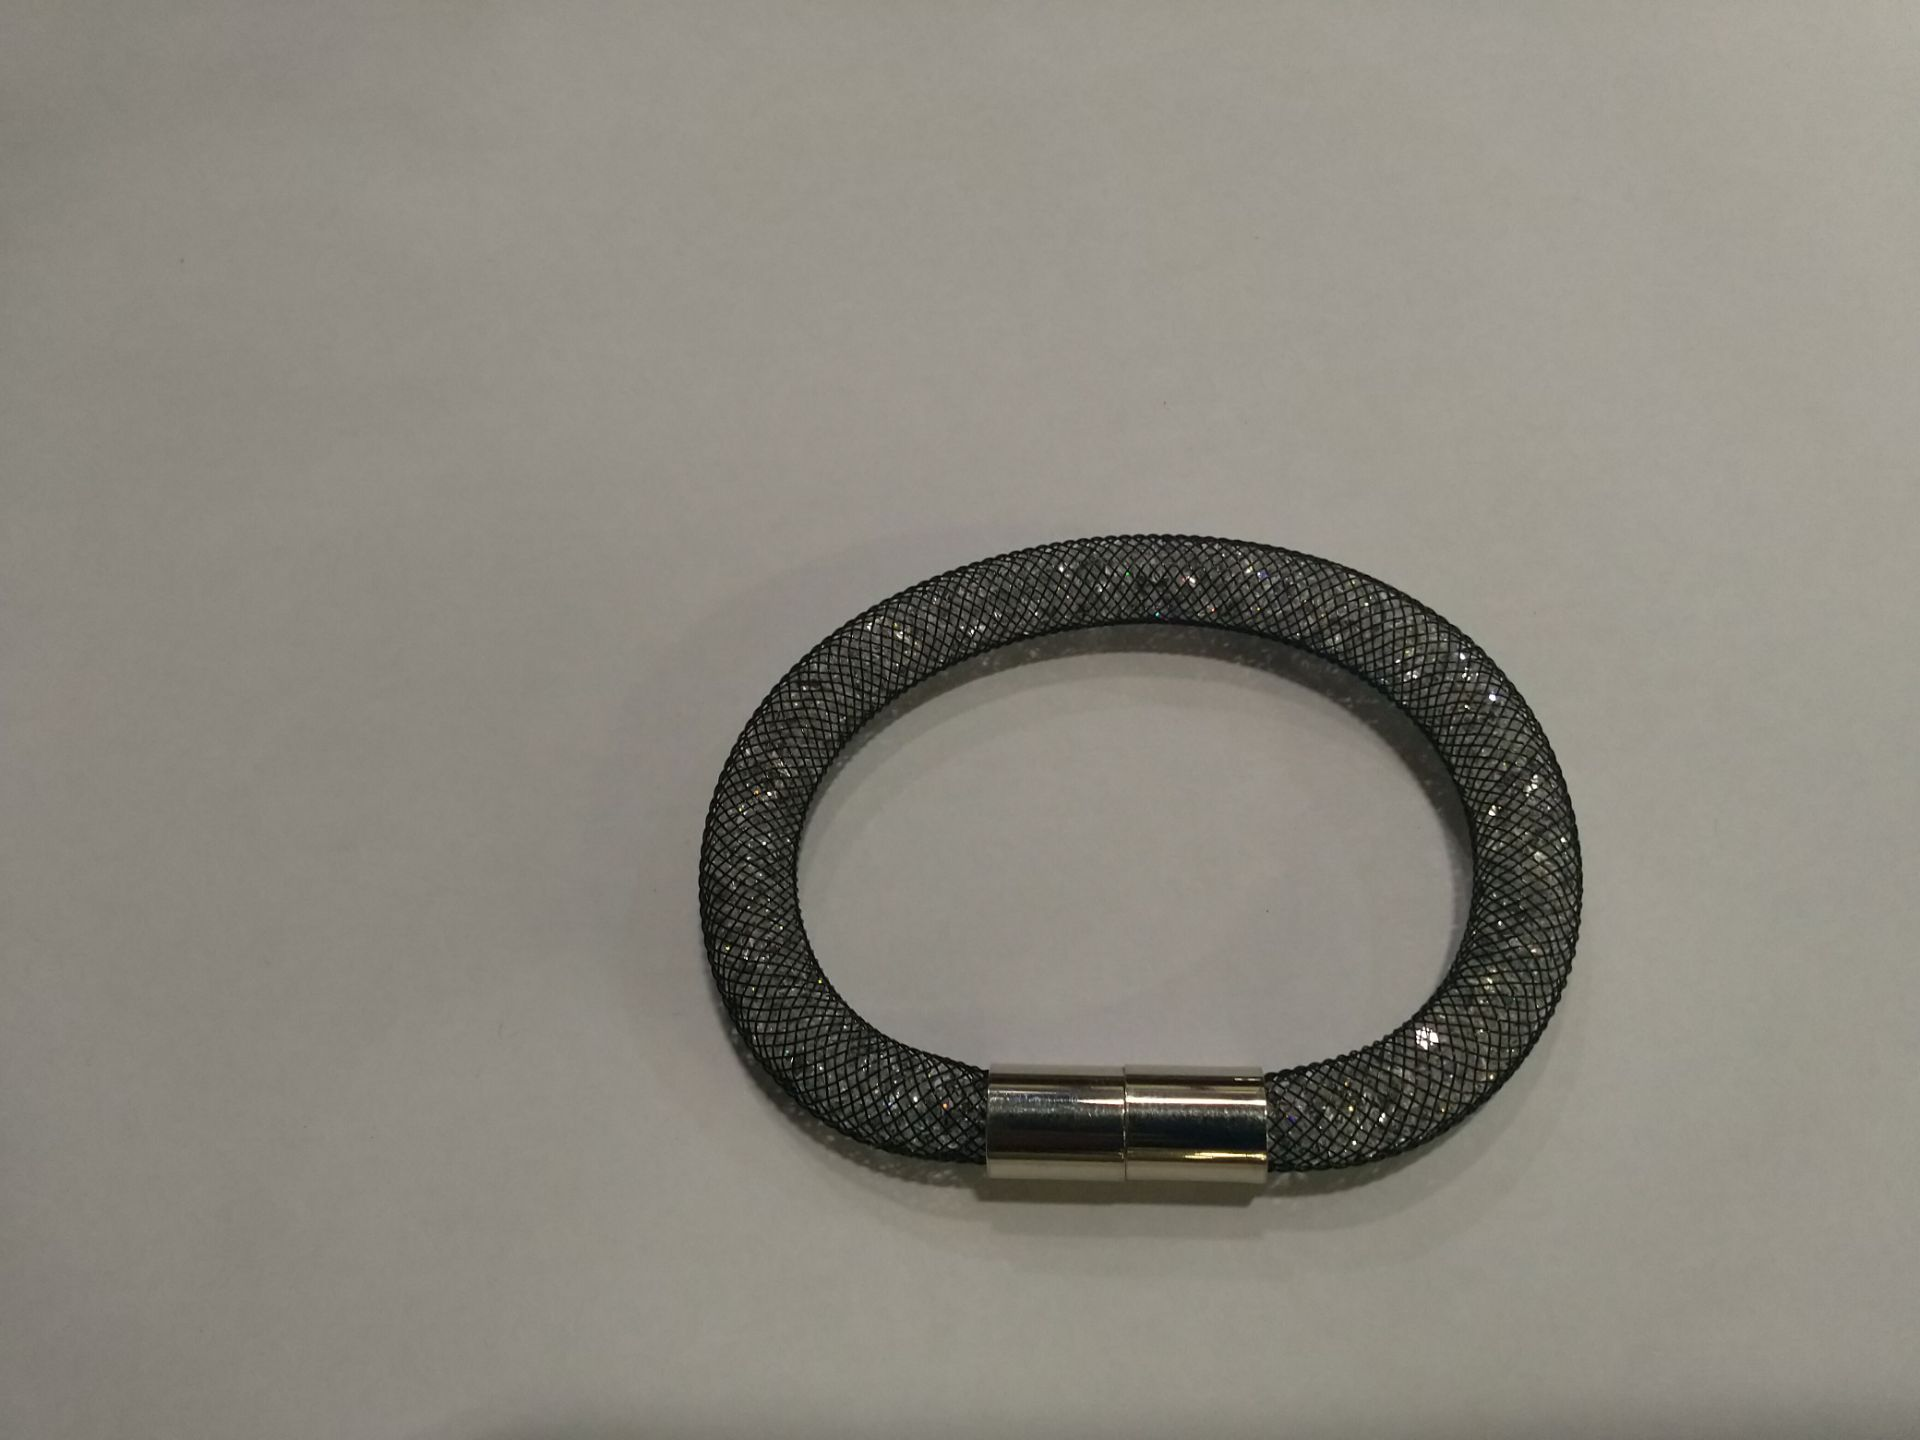 Lot 23 - 35 LE Fiorelli Mesh Bracelet RRP £525